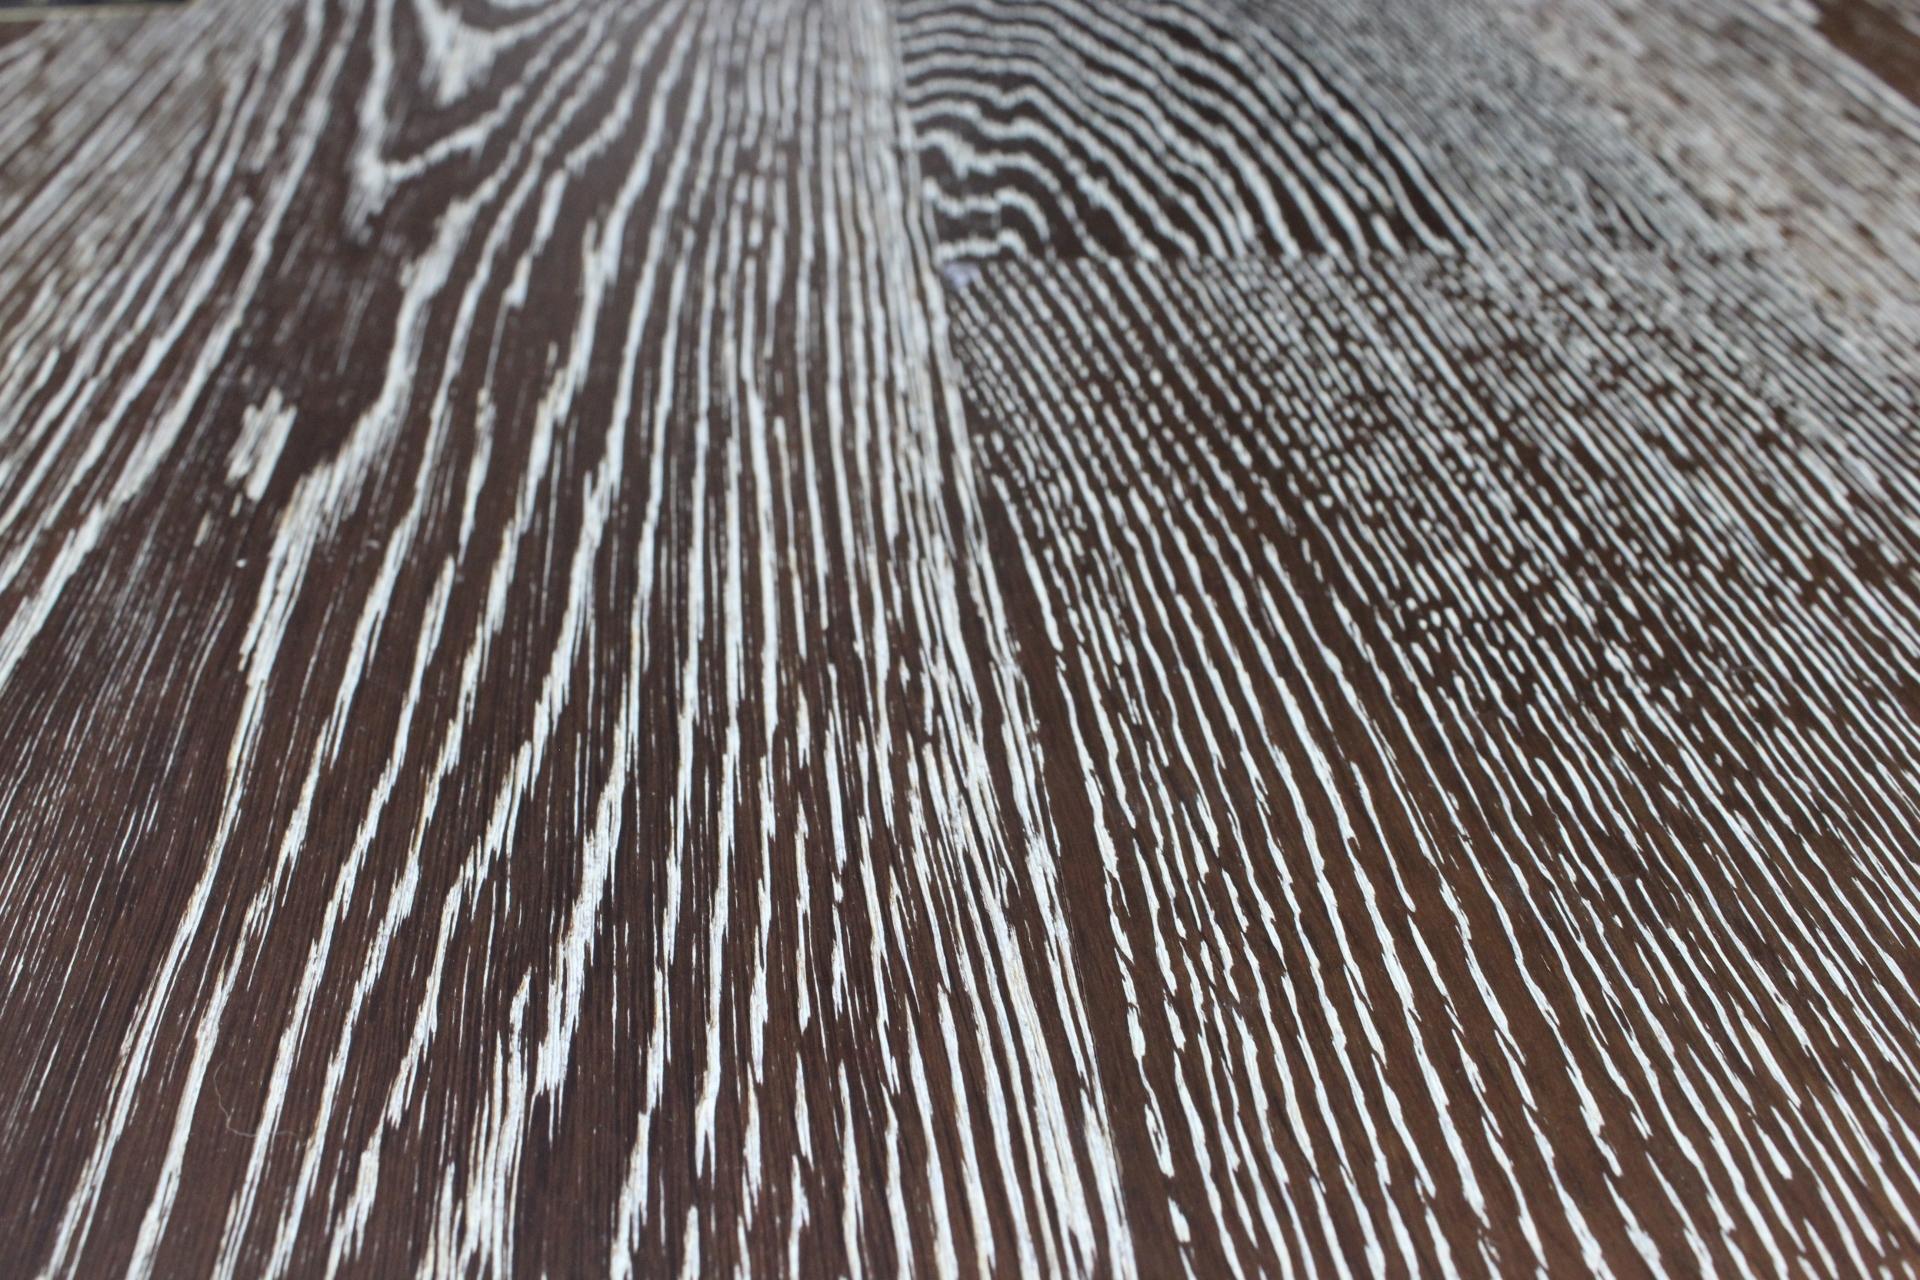 Hardwood, prefinished floor, engineered wood, solid wood, lifestyle, hard surface, prefinished hardwood, prefinished wood, home, design, interior design, wood floor design, baltic wood